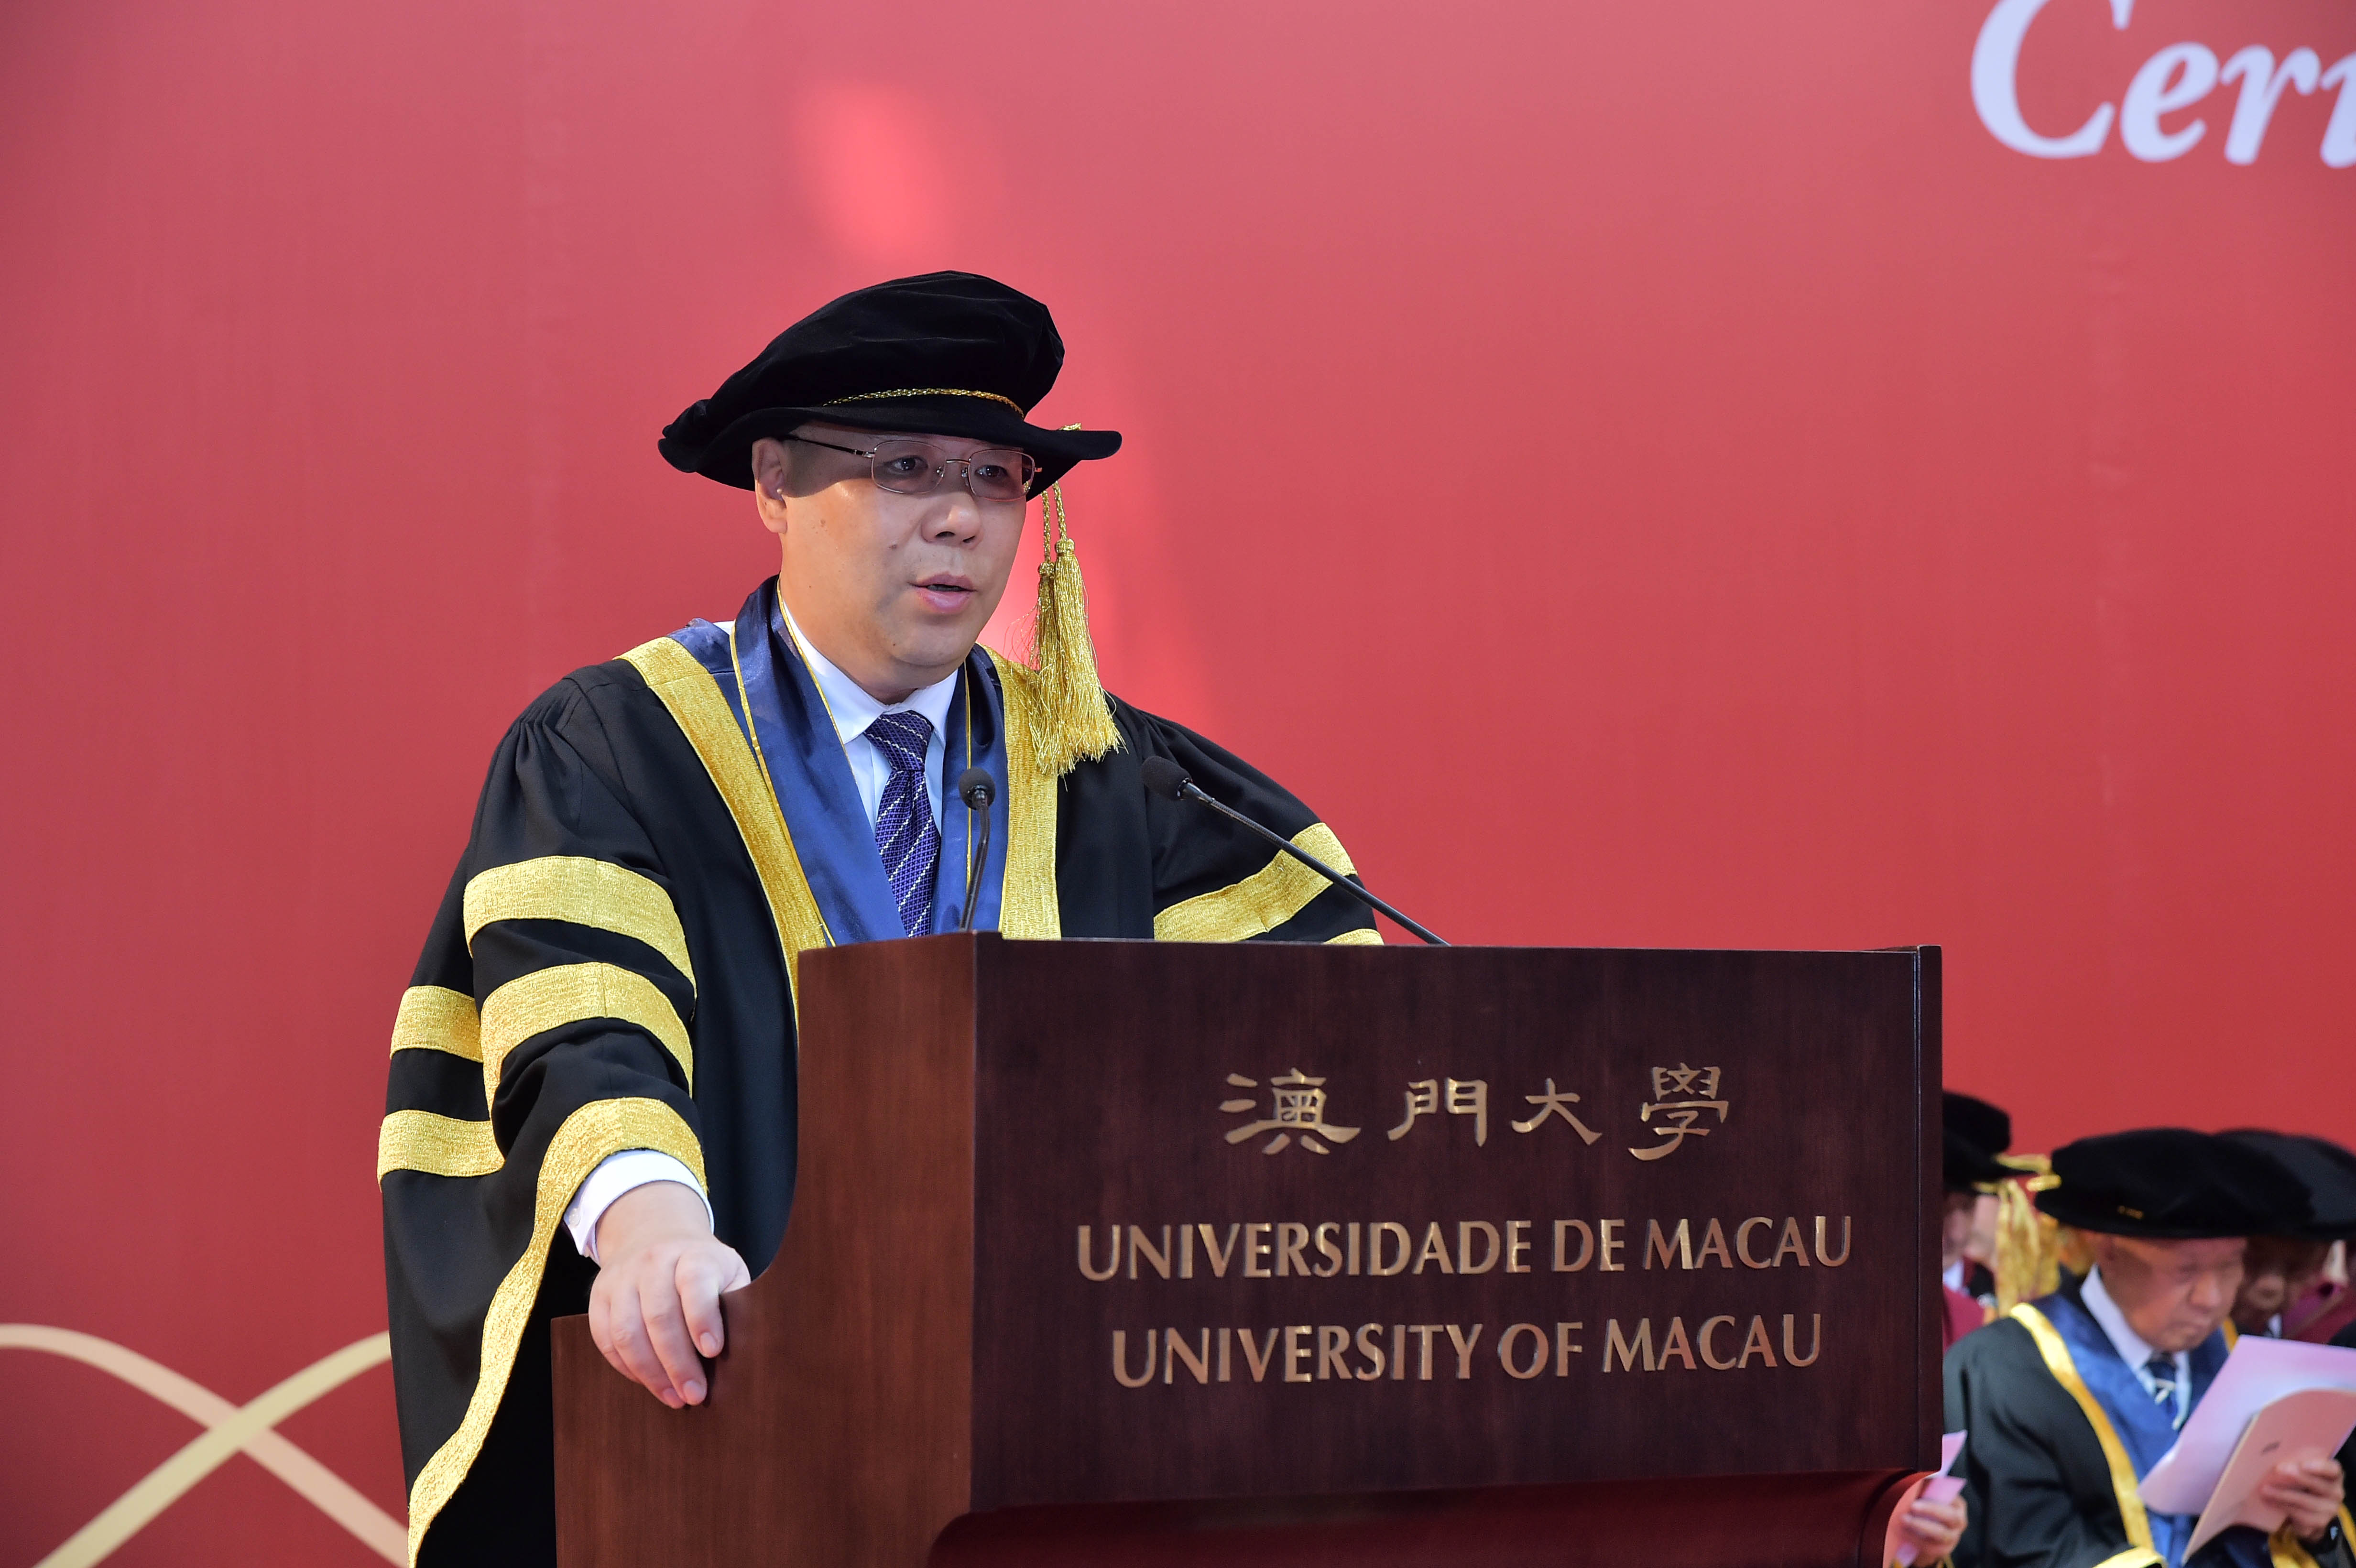 Chui Sai On praises UM for its effort to improve teaching quality